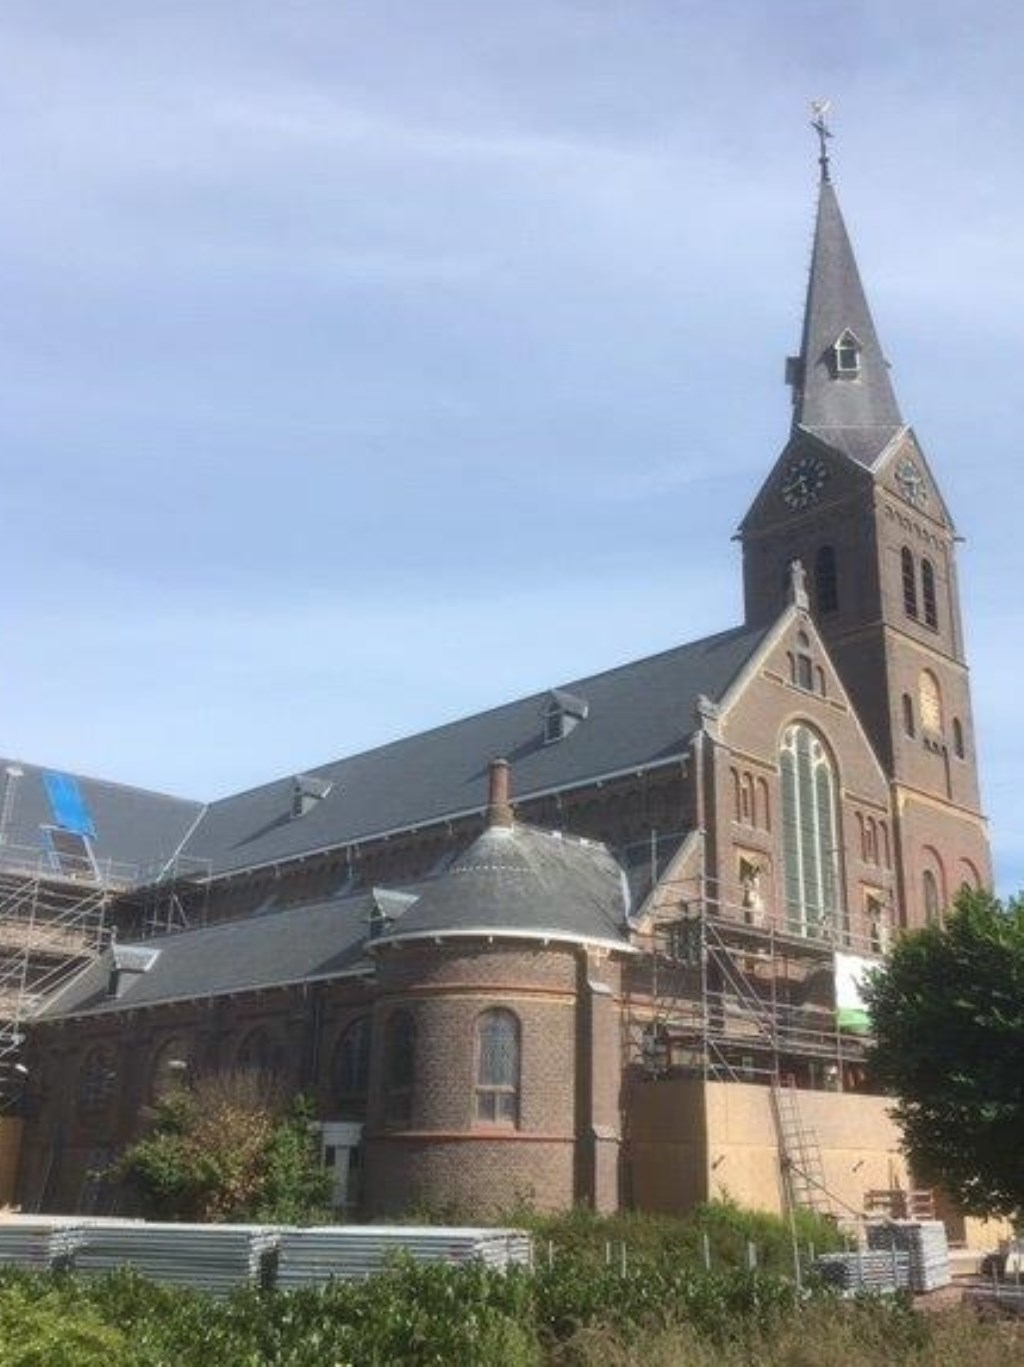 Foto: www.corneliuskerk-limmen.nl © Uitkijkpost Media B.v.